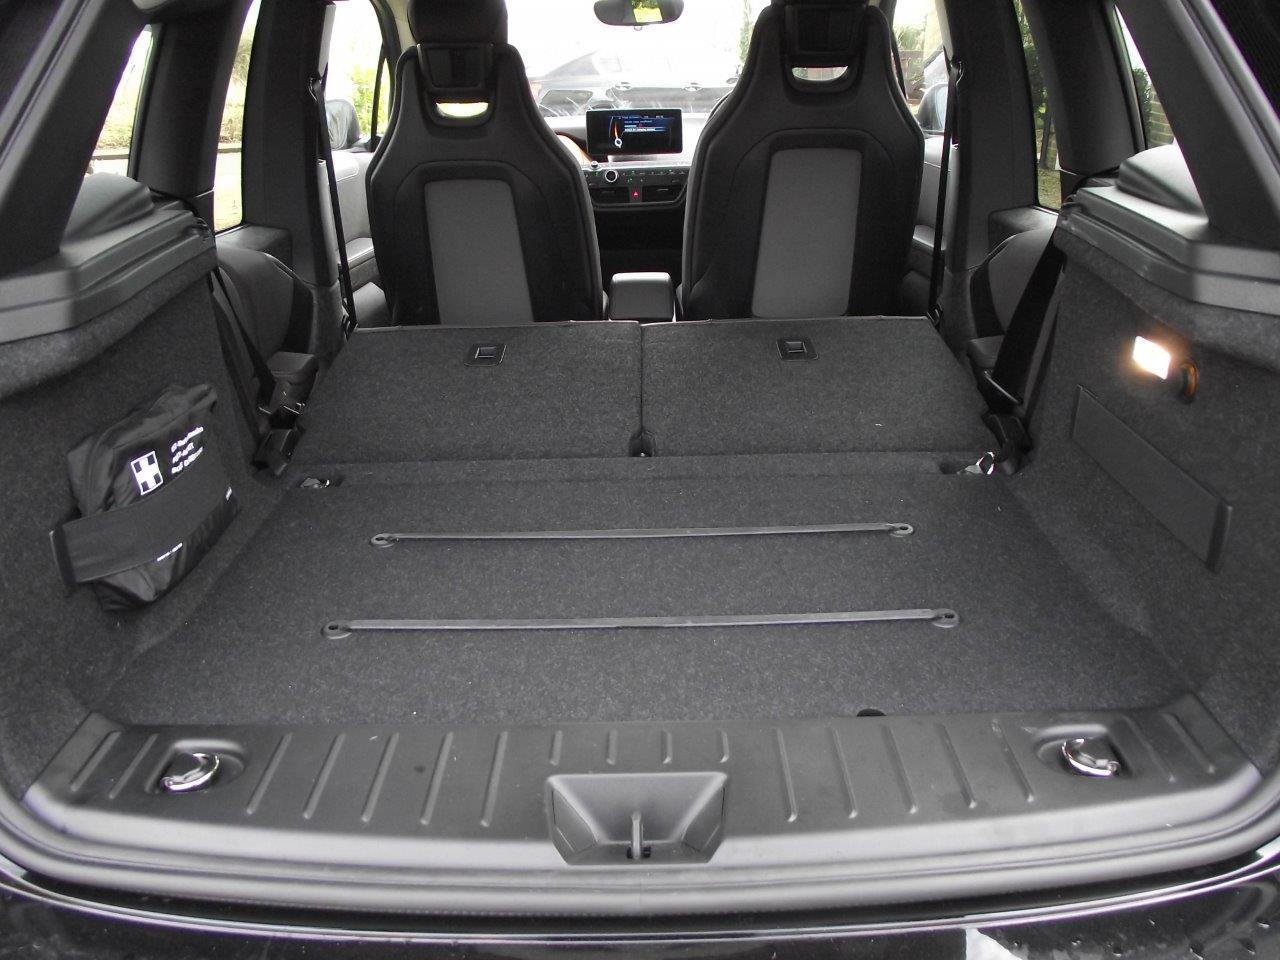 BMW i3 Seat Layout